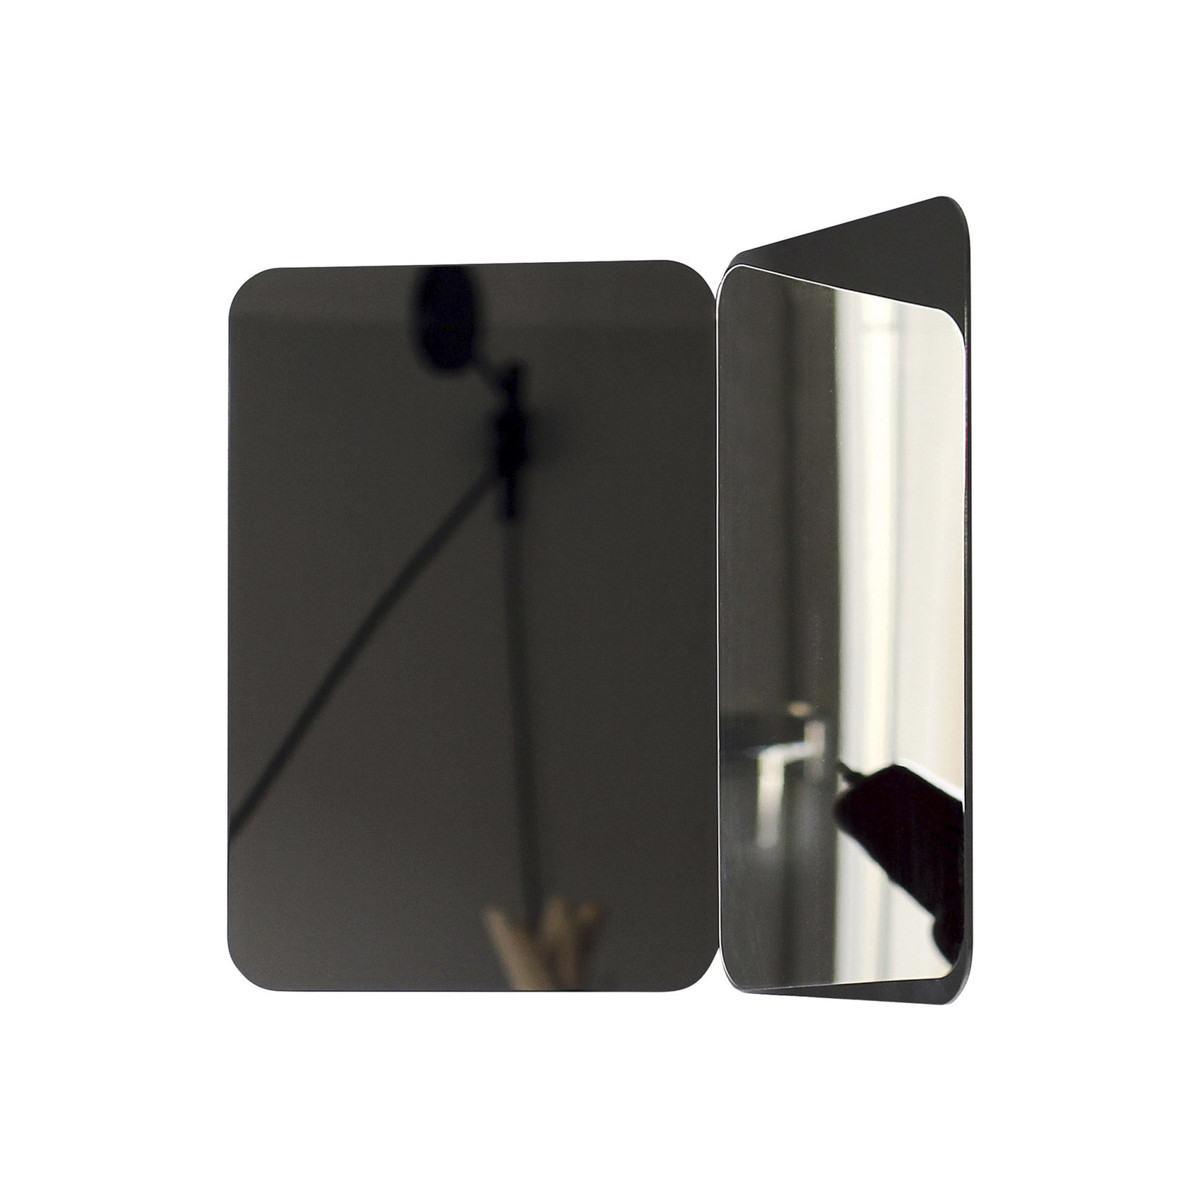 Artek 124 Degree Mirror